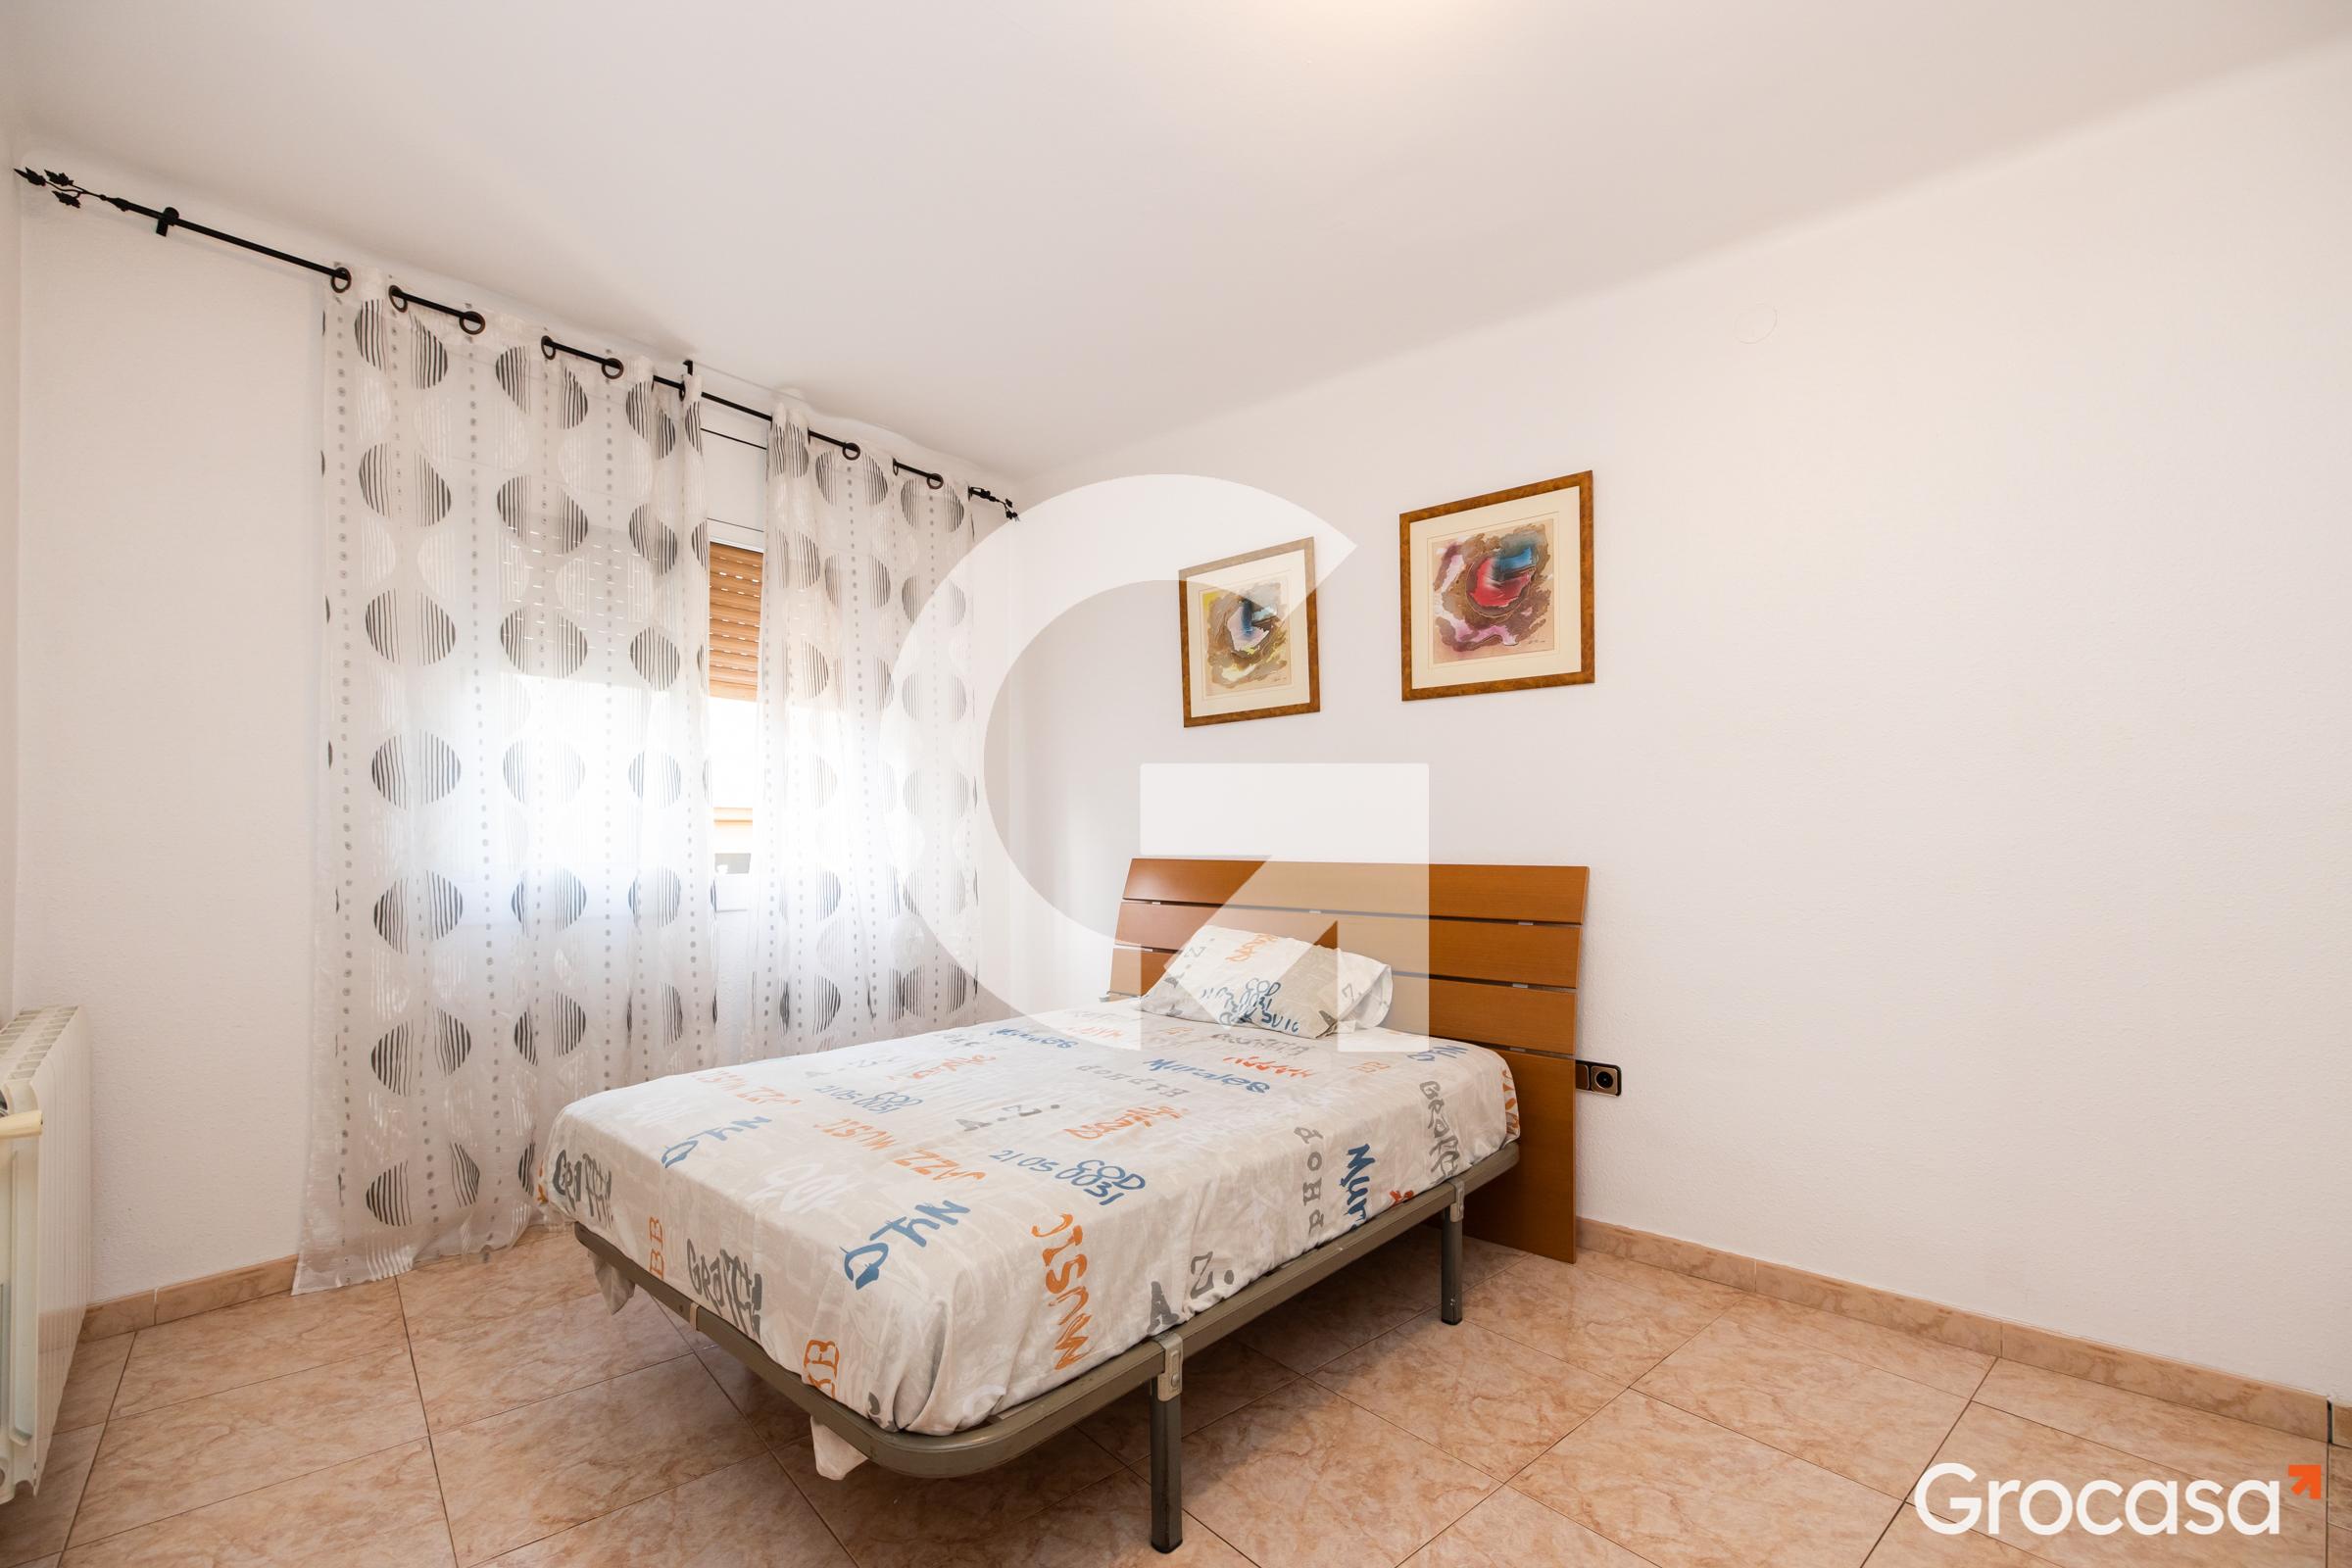 Piso en Can vidalet en Esplugues de Llobregat en Venta por 130.000€